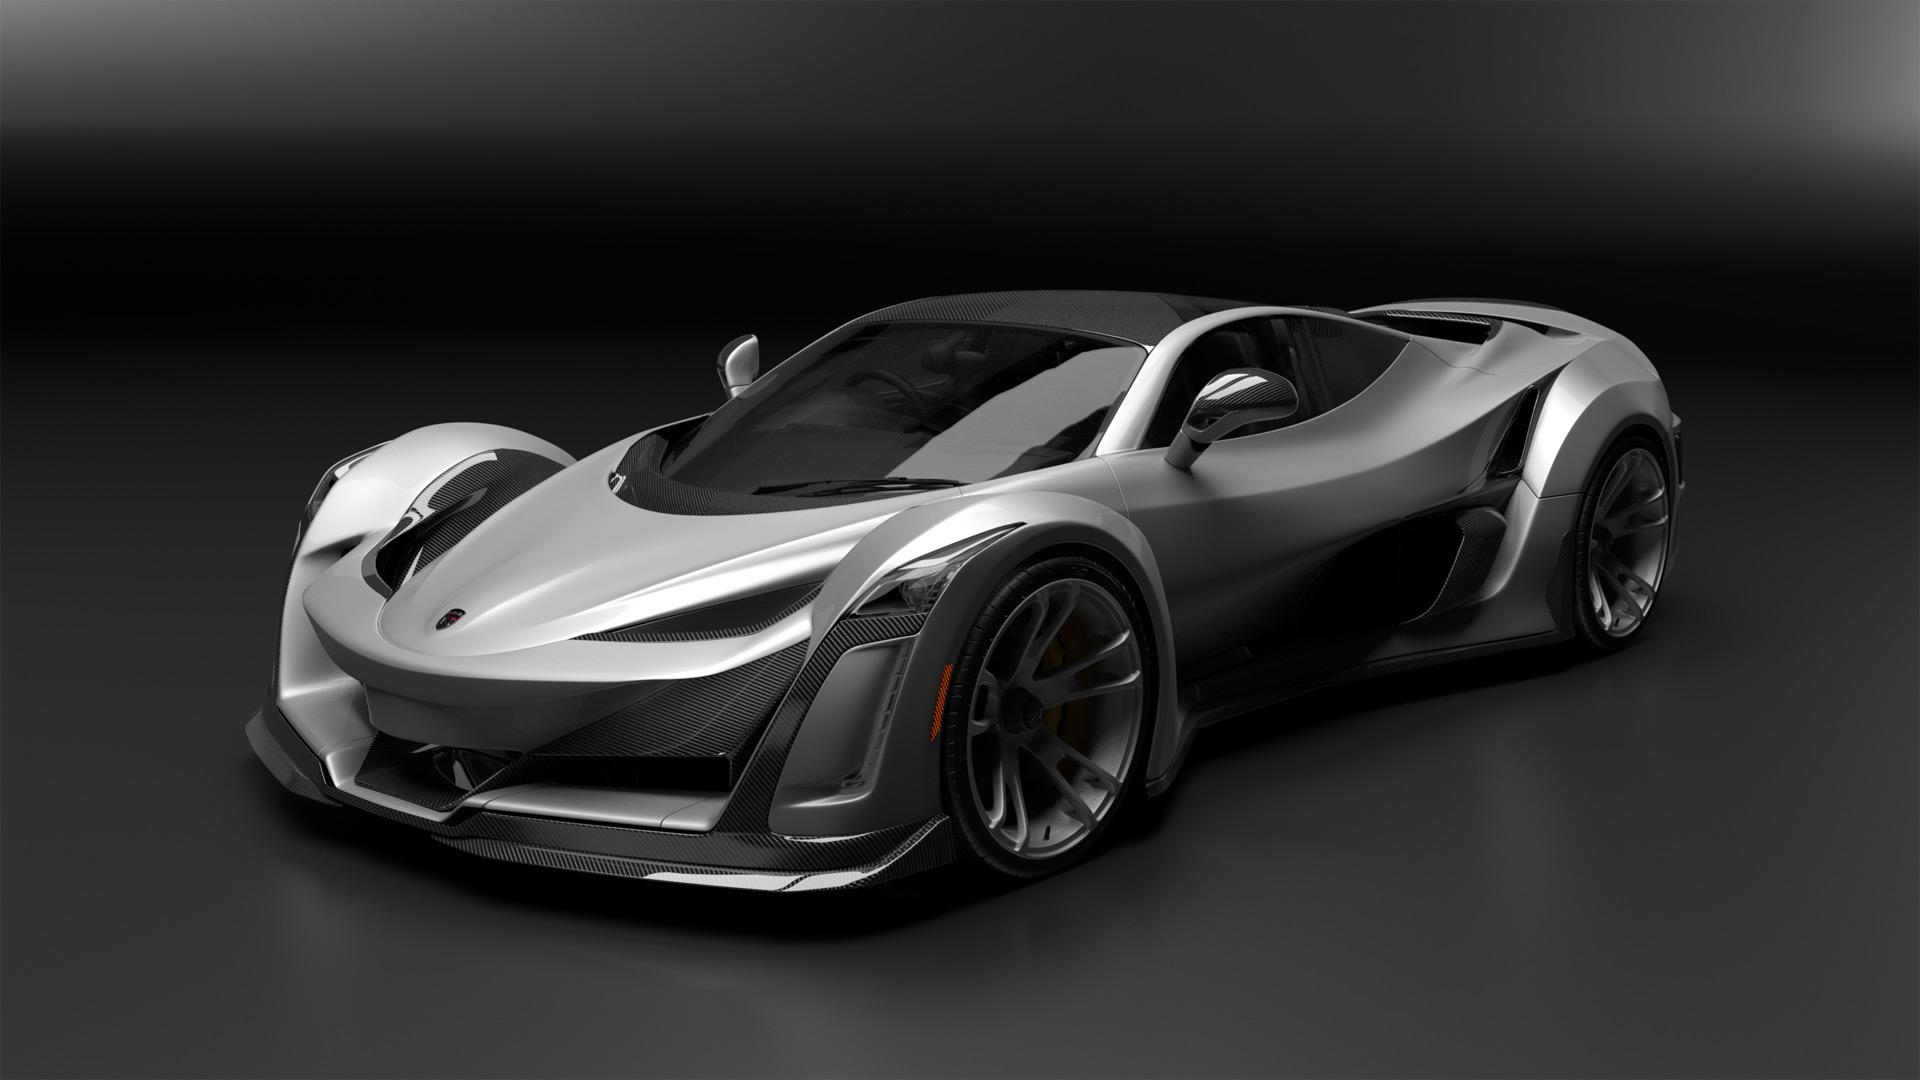 Canada S Anibal Shows Horsepower Supercar Based On Porsche